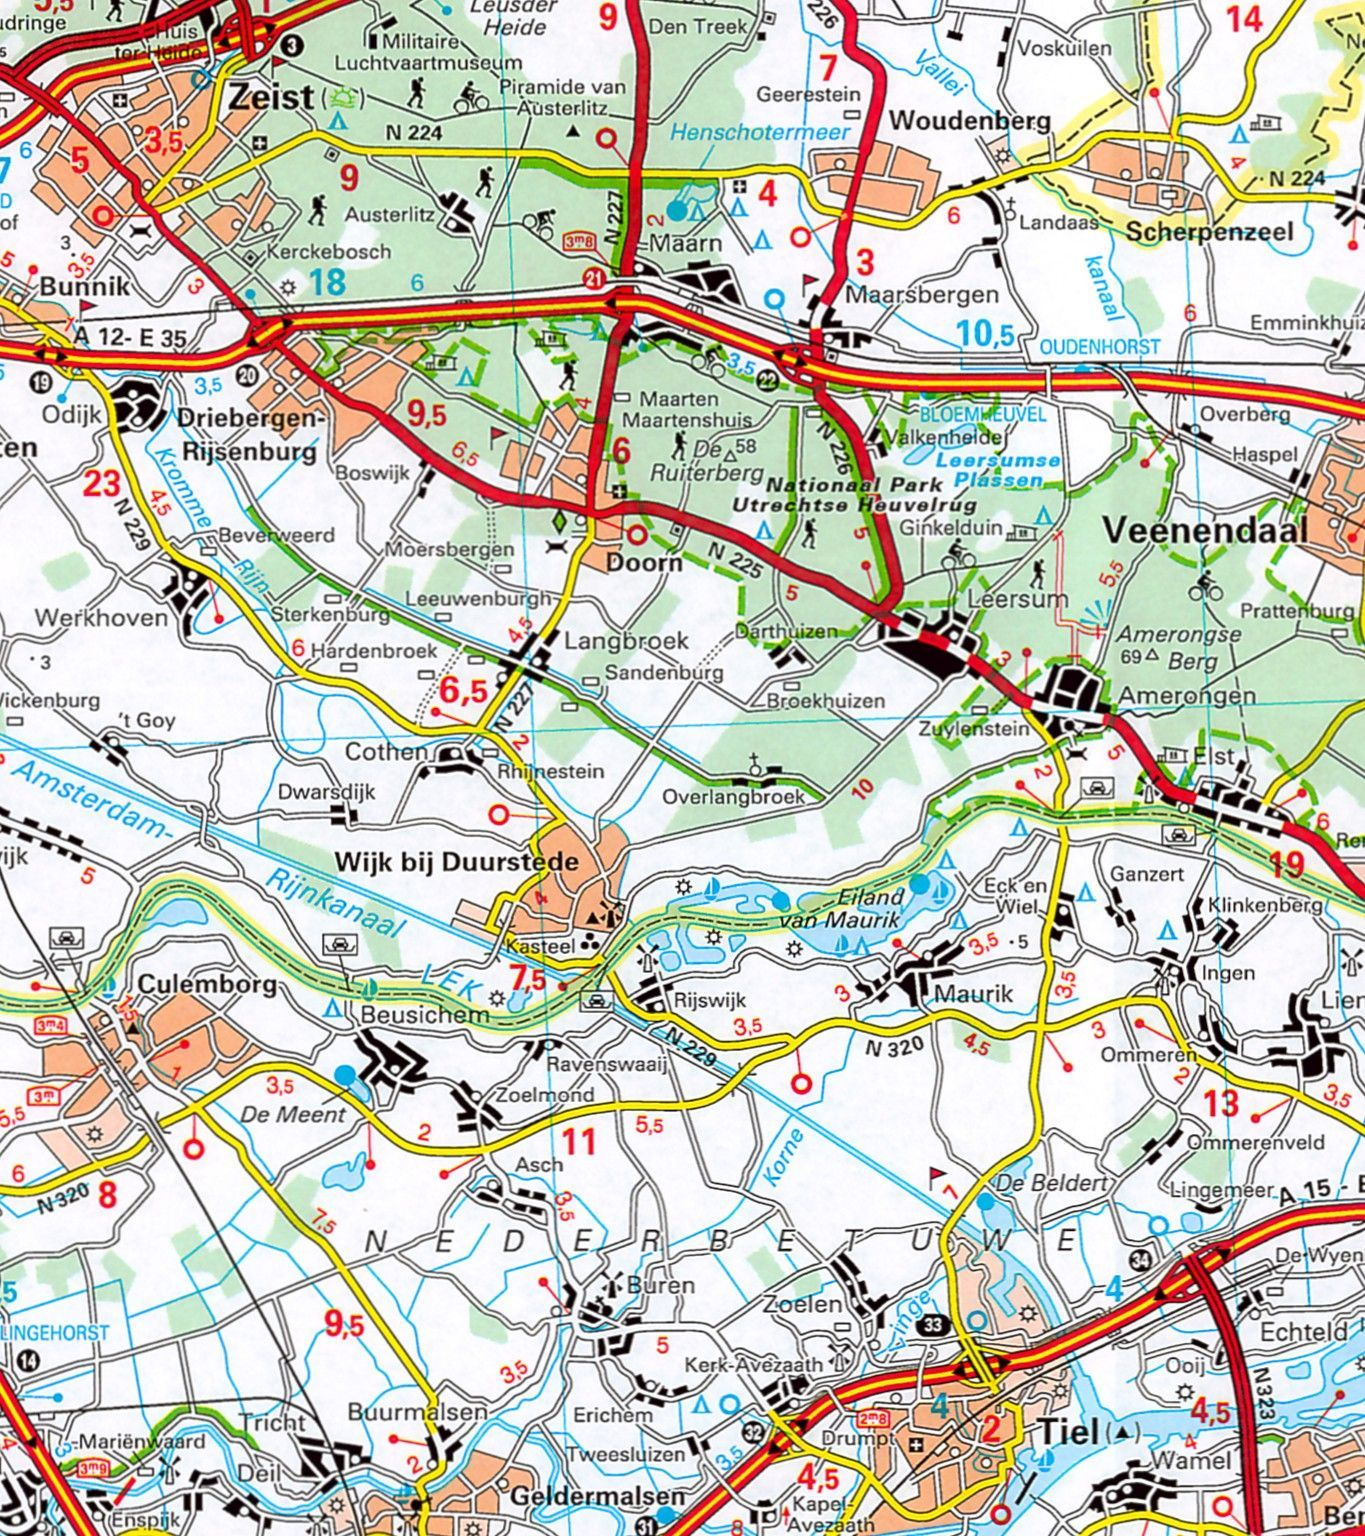 Landkaart Nederland Groot